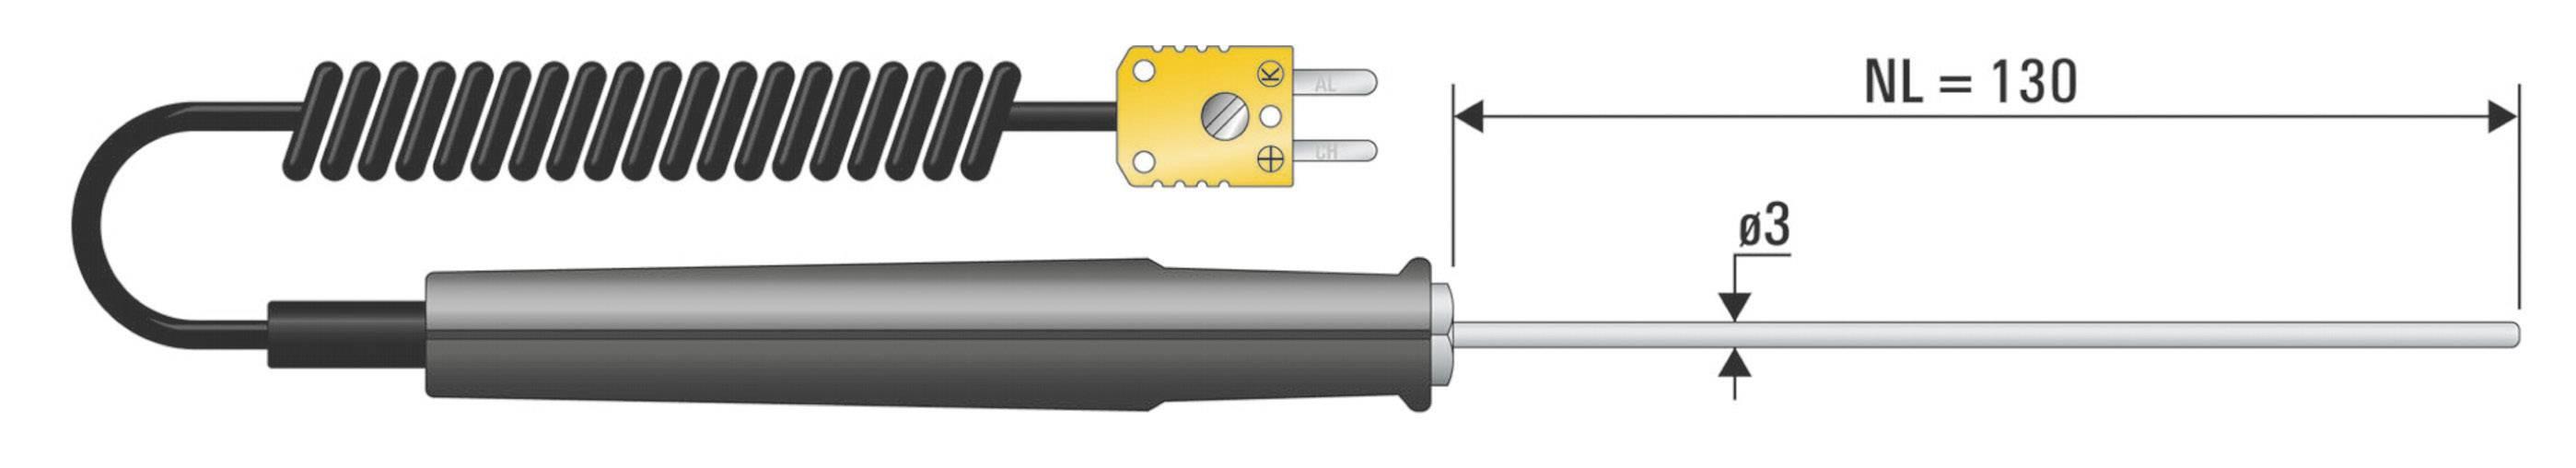 Teplotné čidlo B+B Thermo-Technik typu K (NiCrNi), -50 až 1150 °C